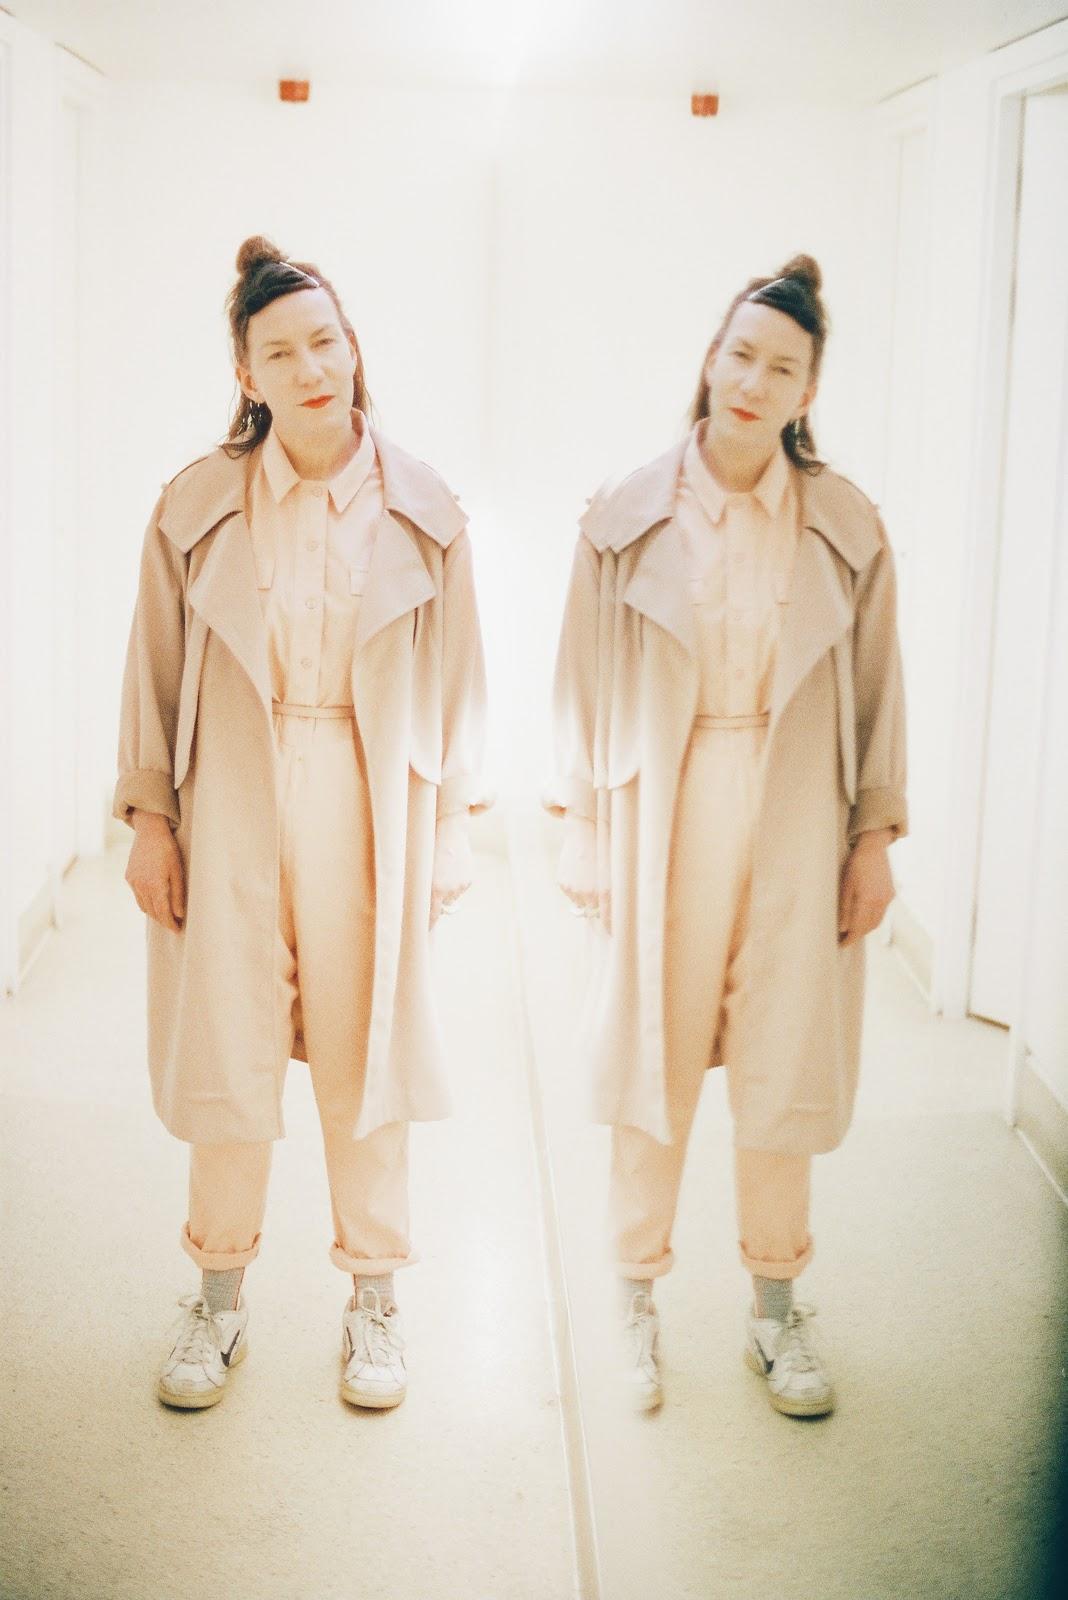 NEWS: Kathryn Joseph shares haunting new single 'Whole'